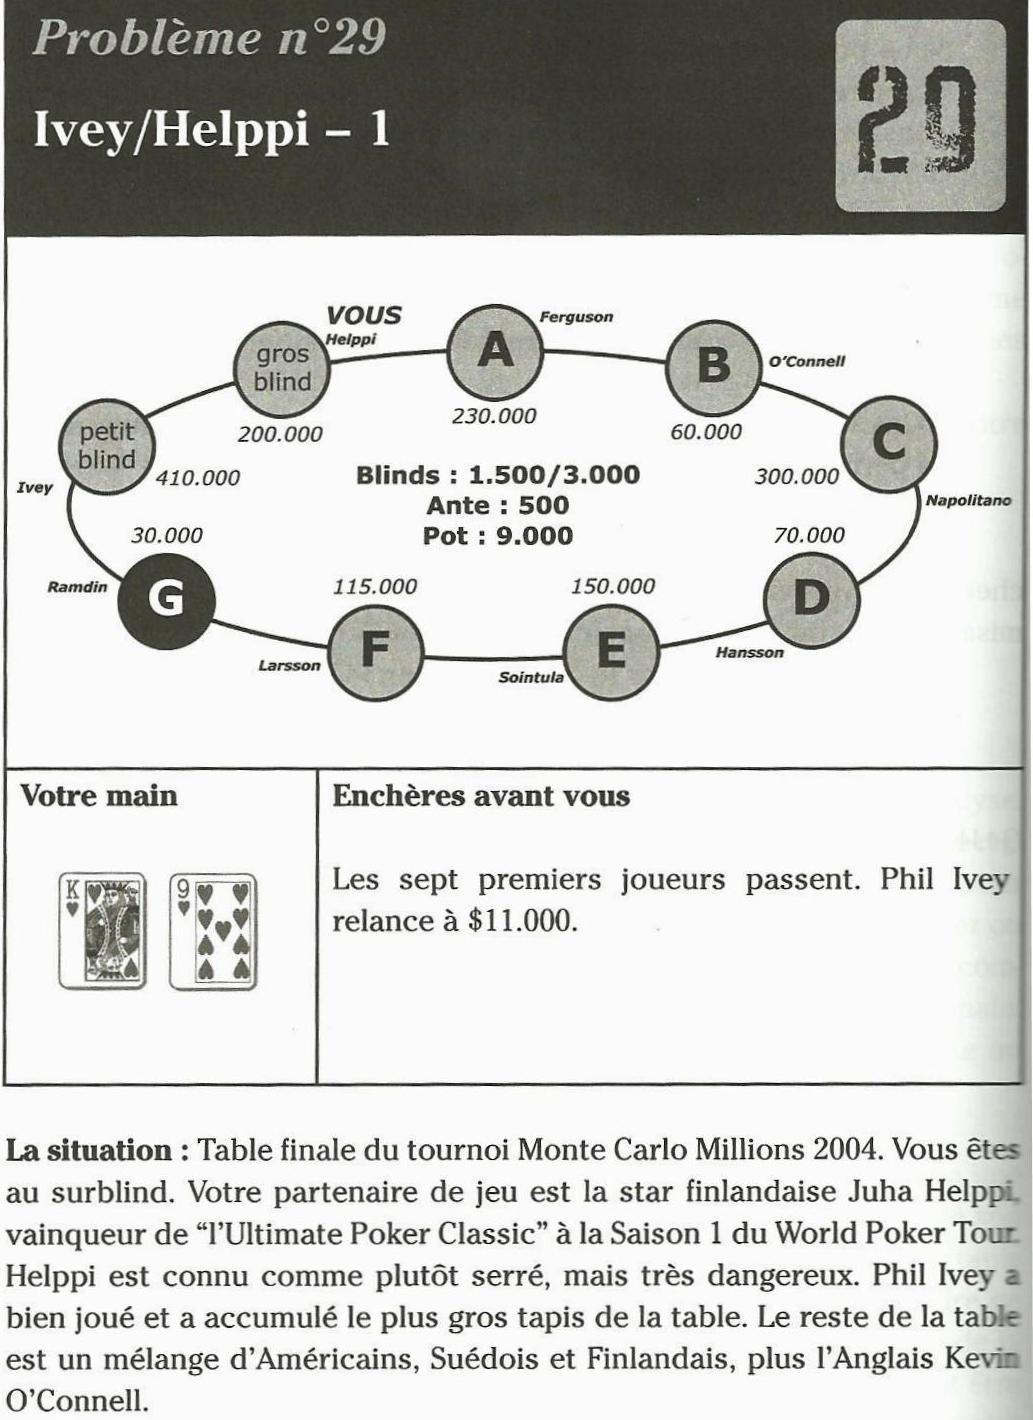 http://www.lirelepoker.com/23-poker-harrington-3.html